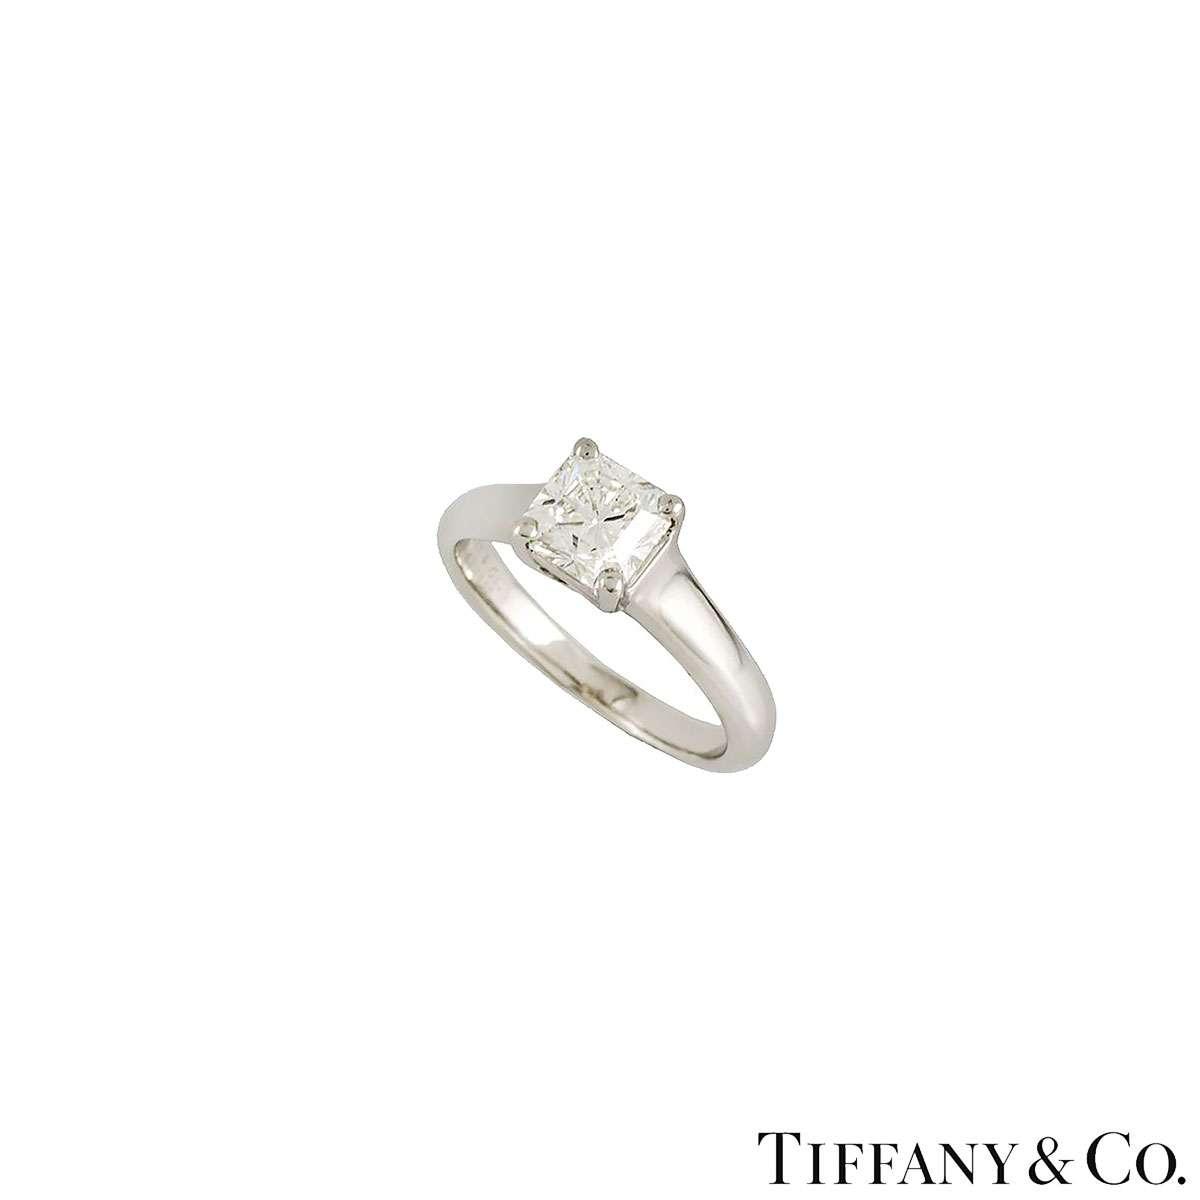 Tiffany & Co Lucida Cut Diamond Ring in Platinum 1.00ct F/VVS1 B&P